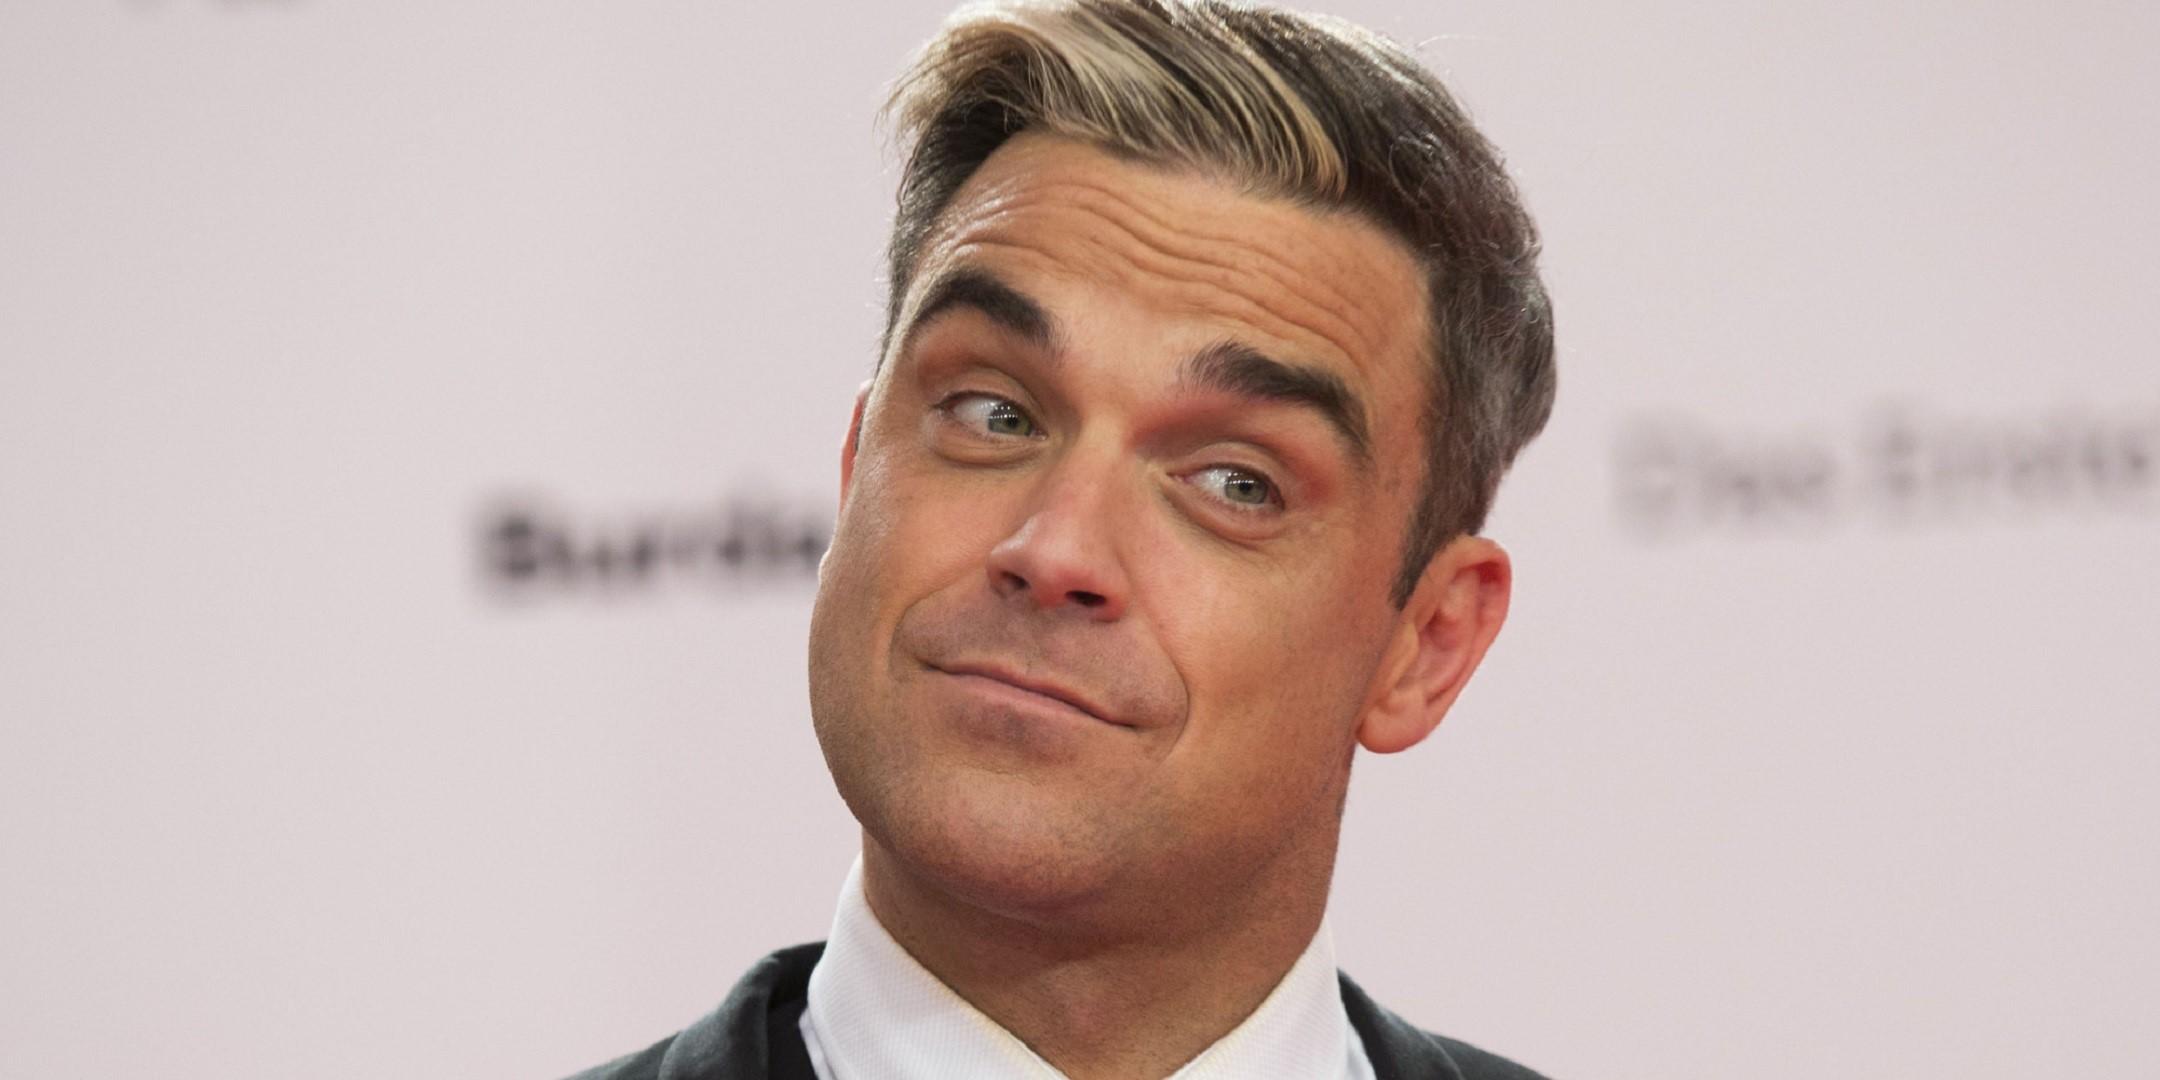 Robbie Williams Widescreen